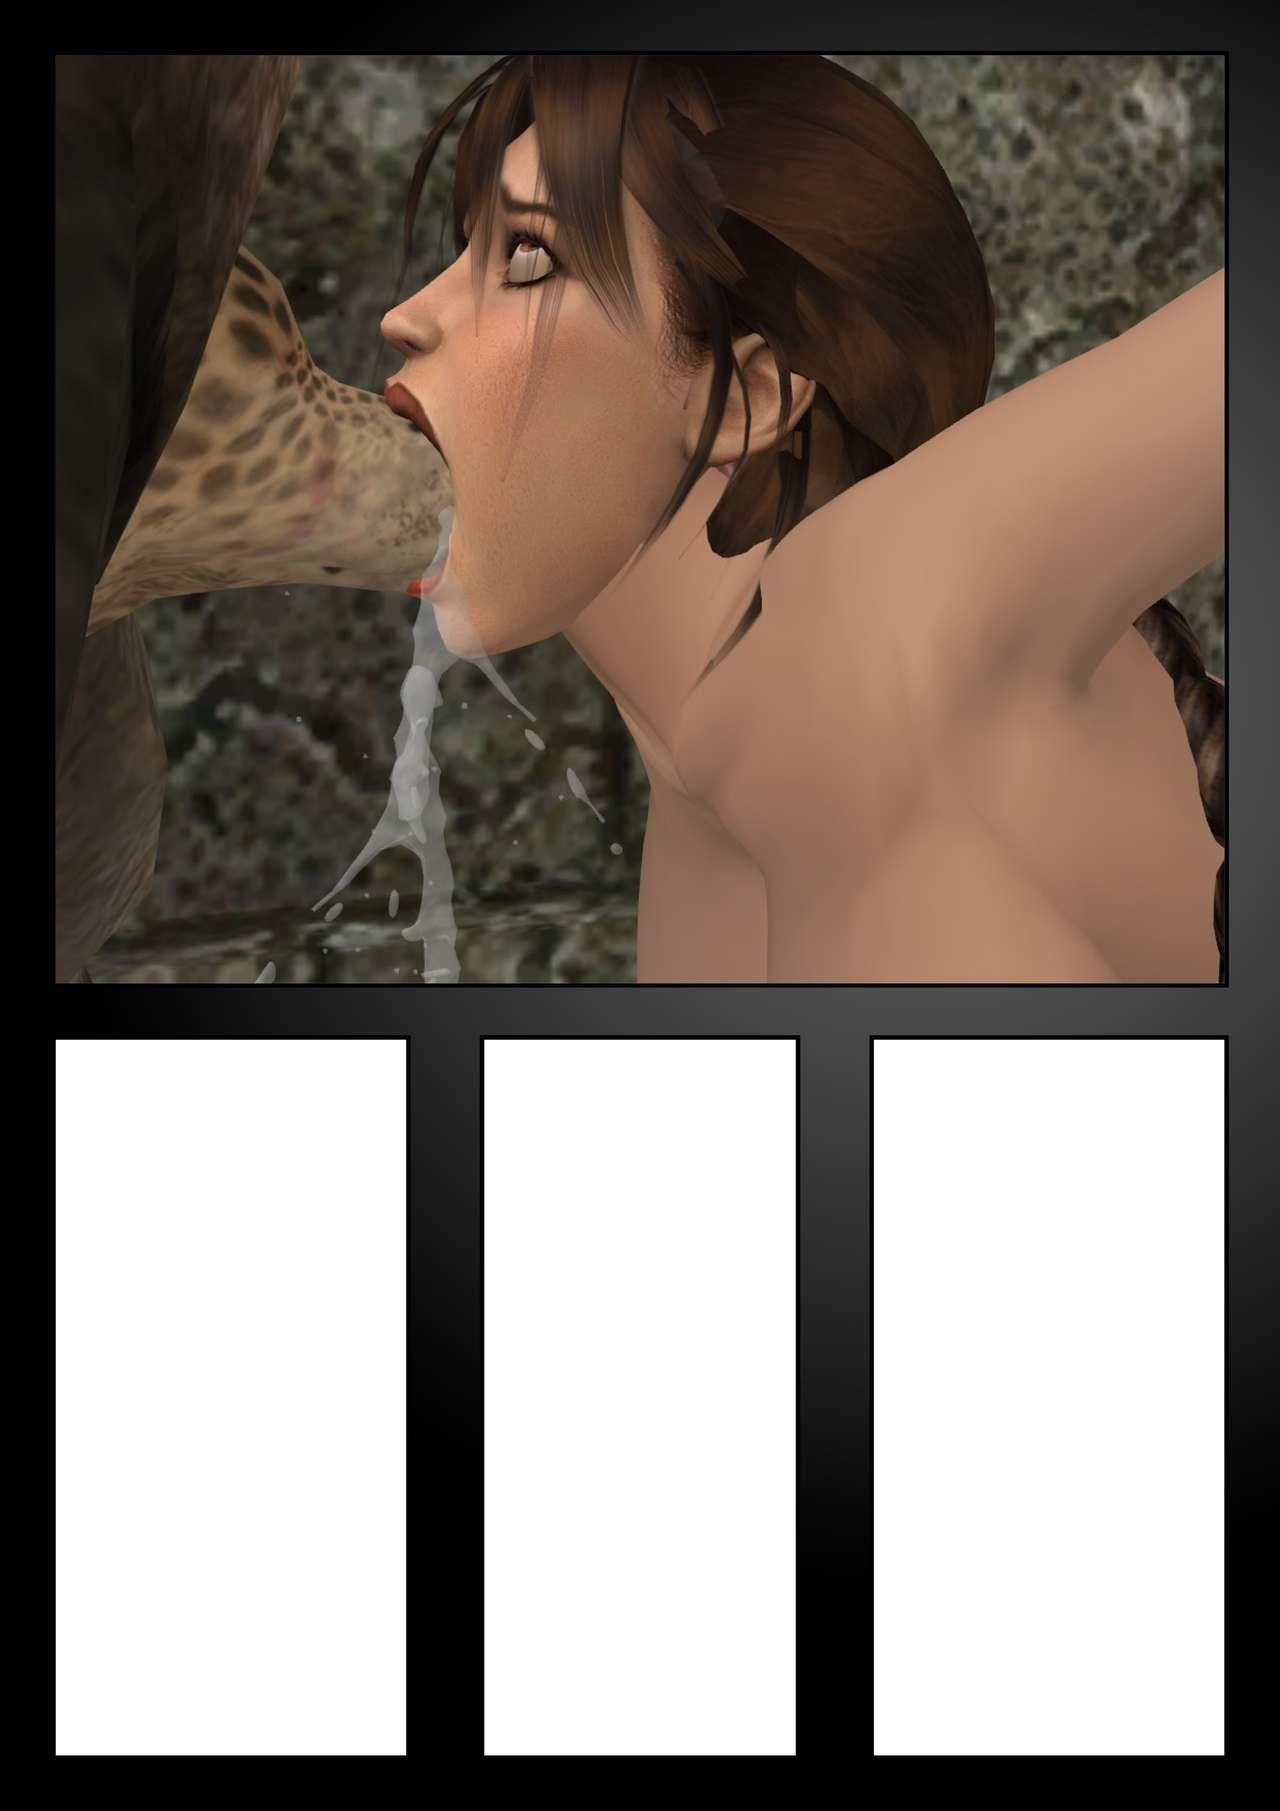 Lara Croft Vs The Minotaurus W.I.P. - part 2